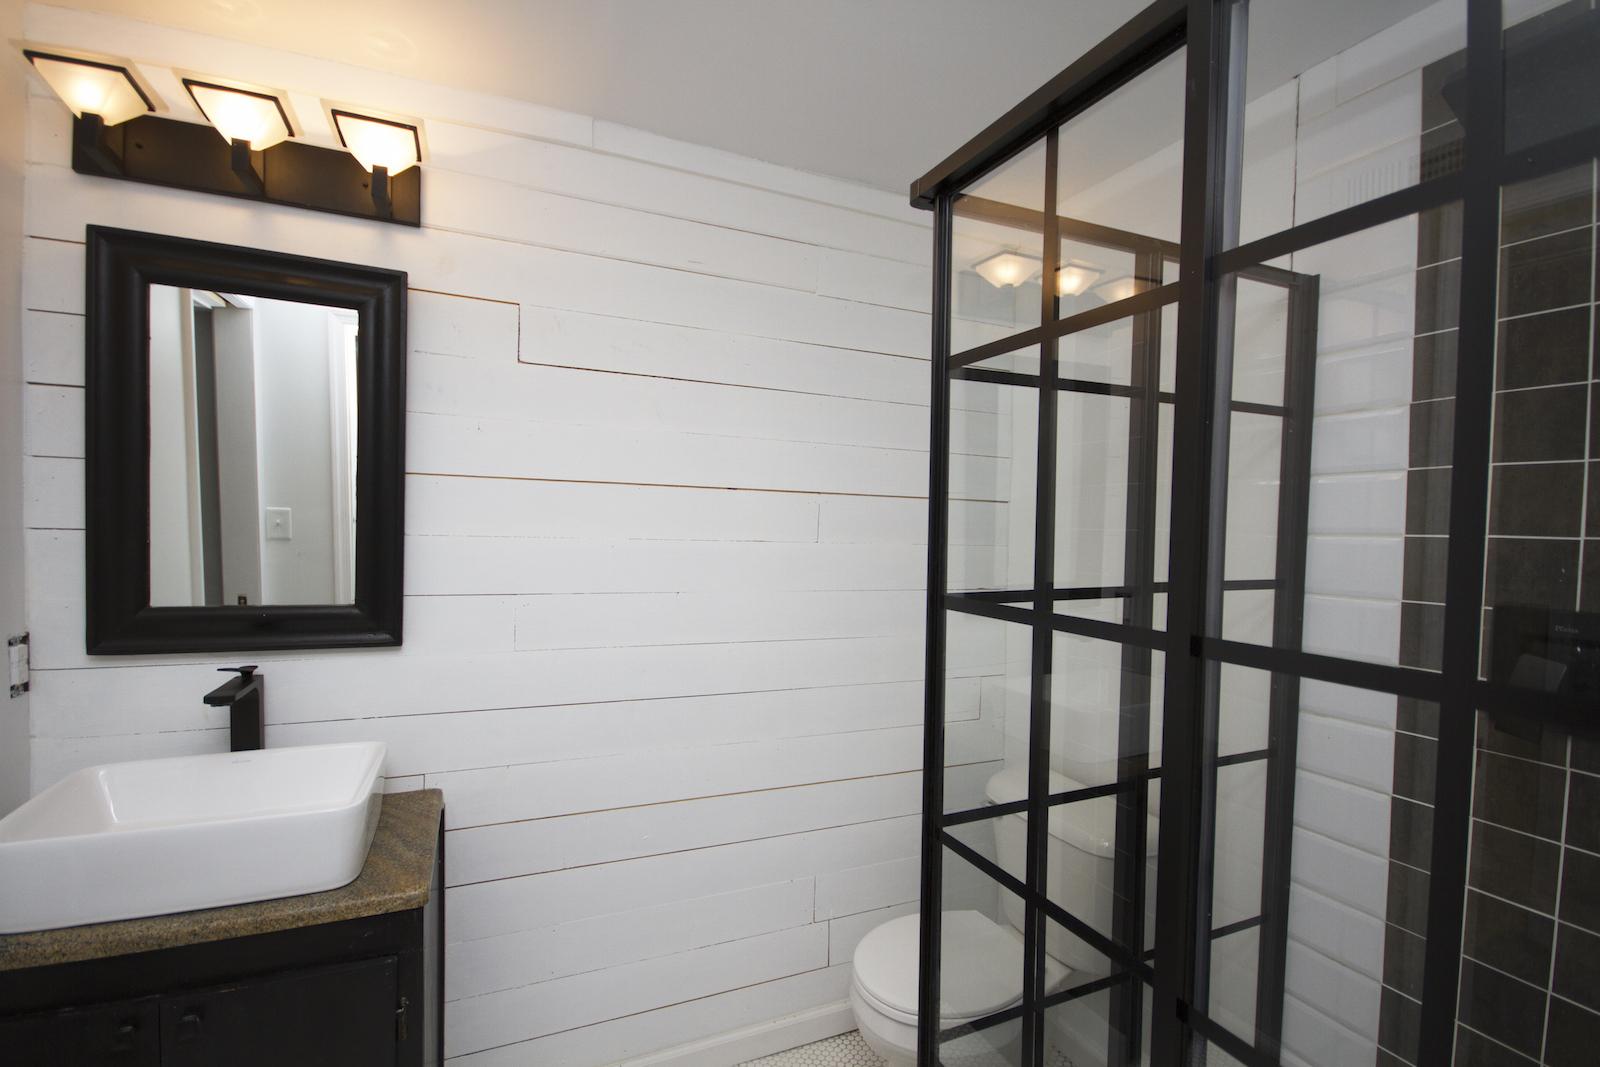 Industrial bathroom design